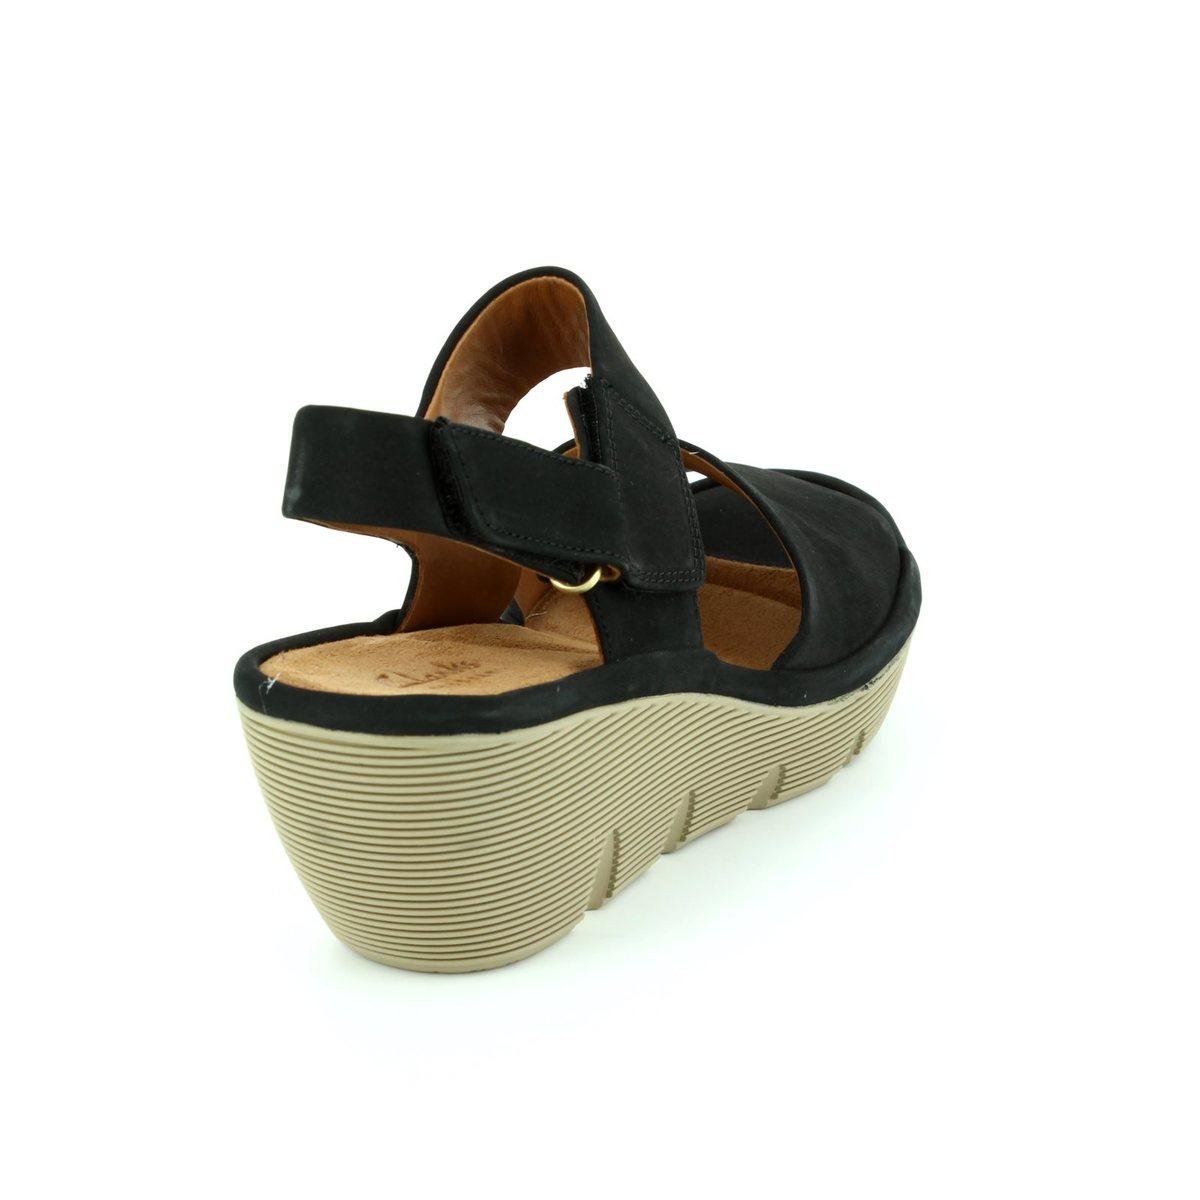 34a5e26b57a Clarks Sandals - Black nubuck - 2428 04D CLARENE ALLURE